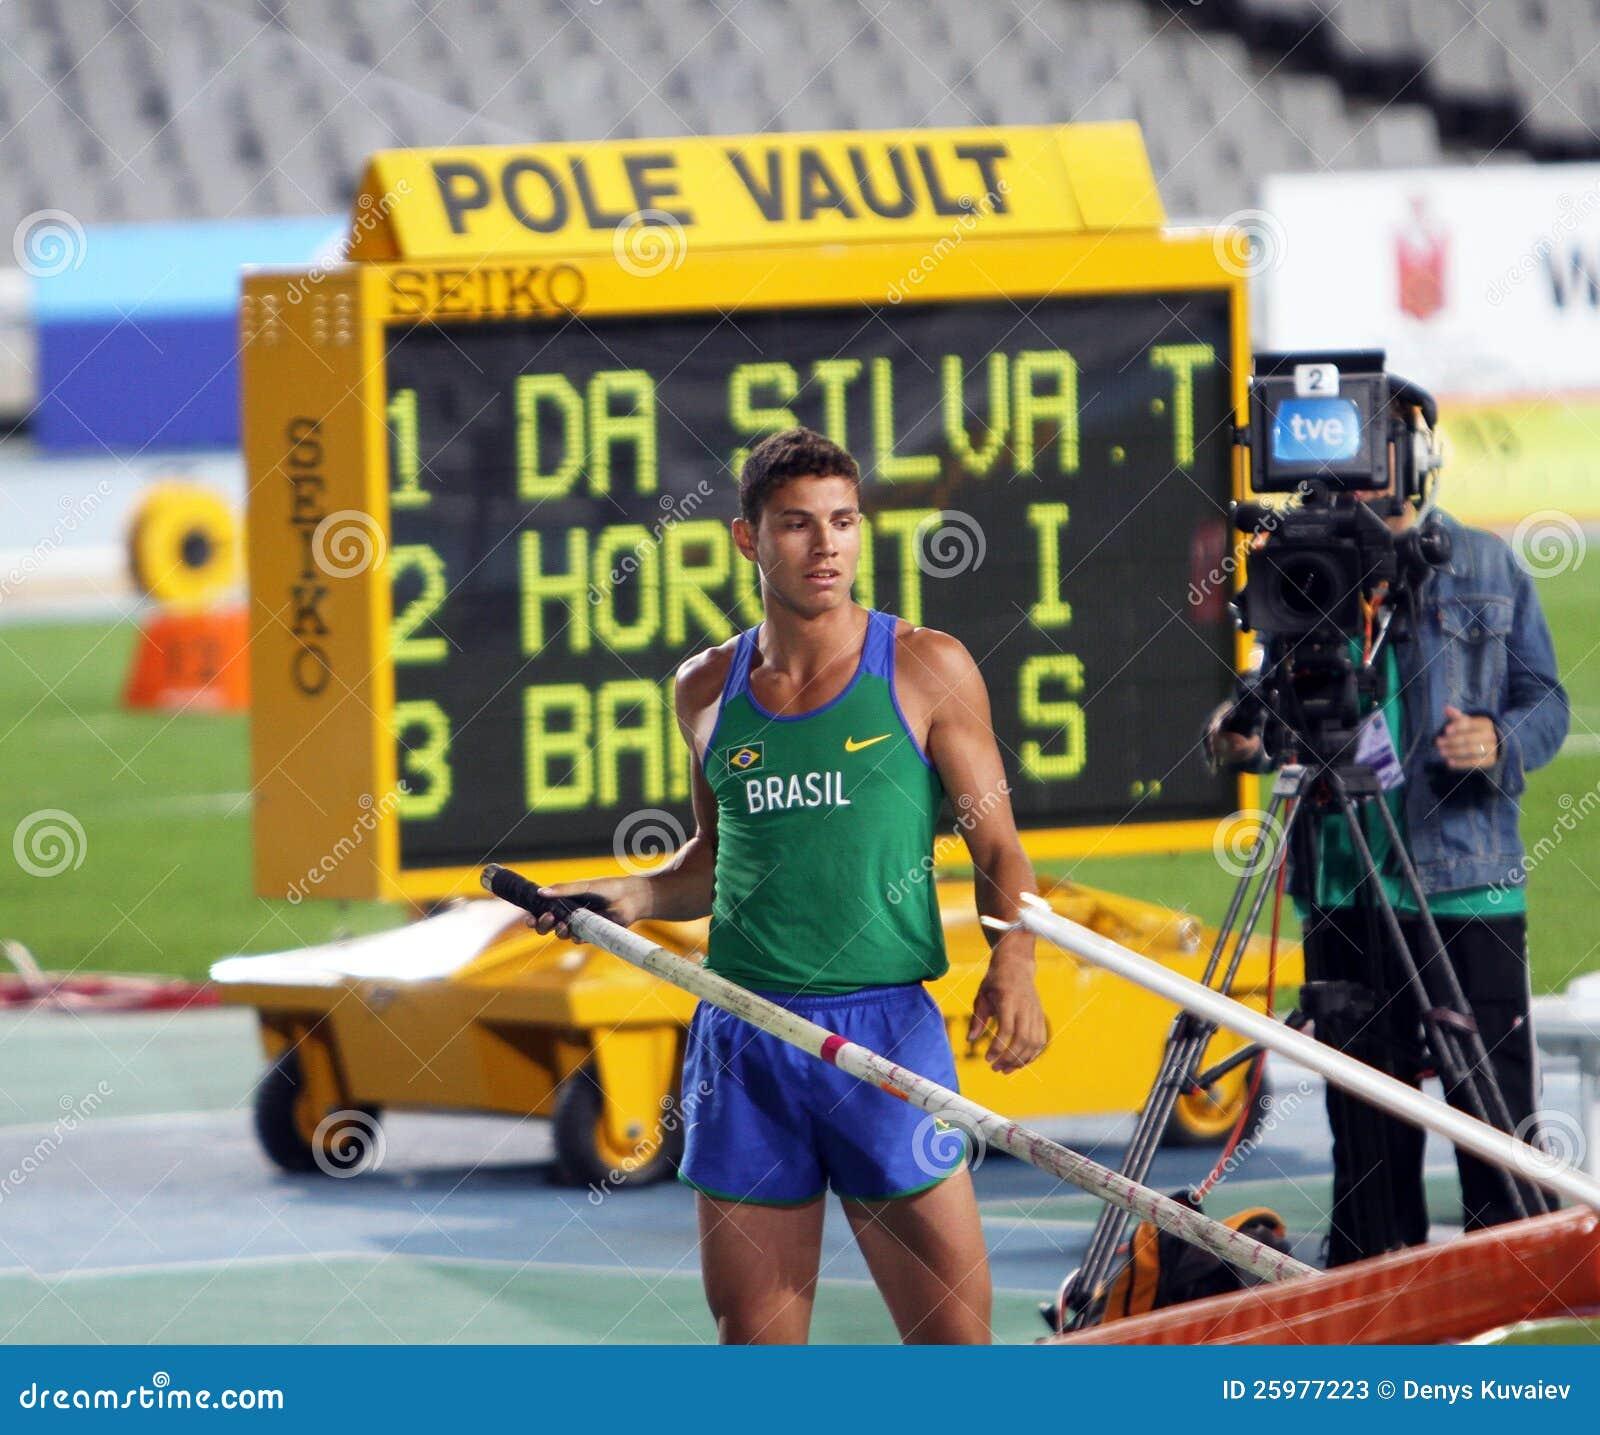 Thiago Braz DA Silva van Brazilië de winnaar